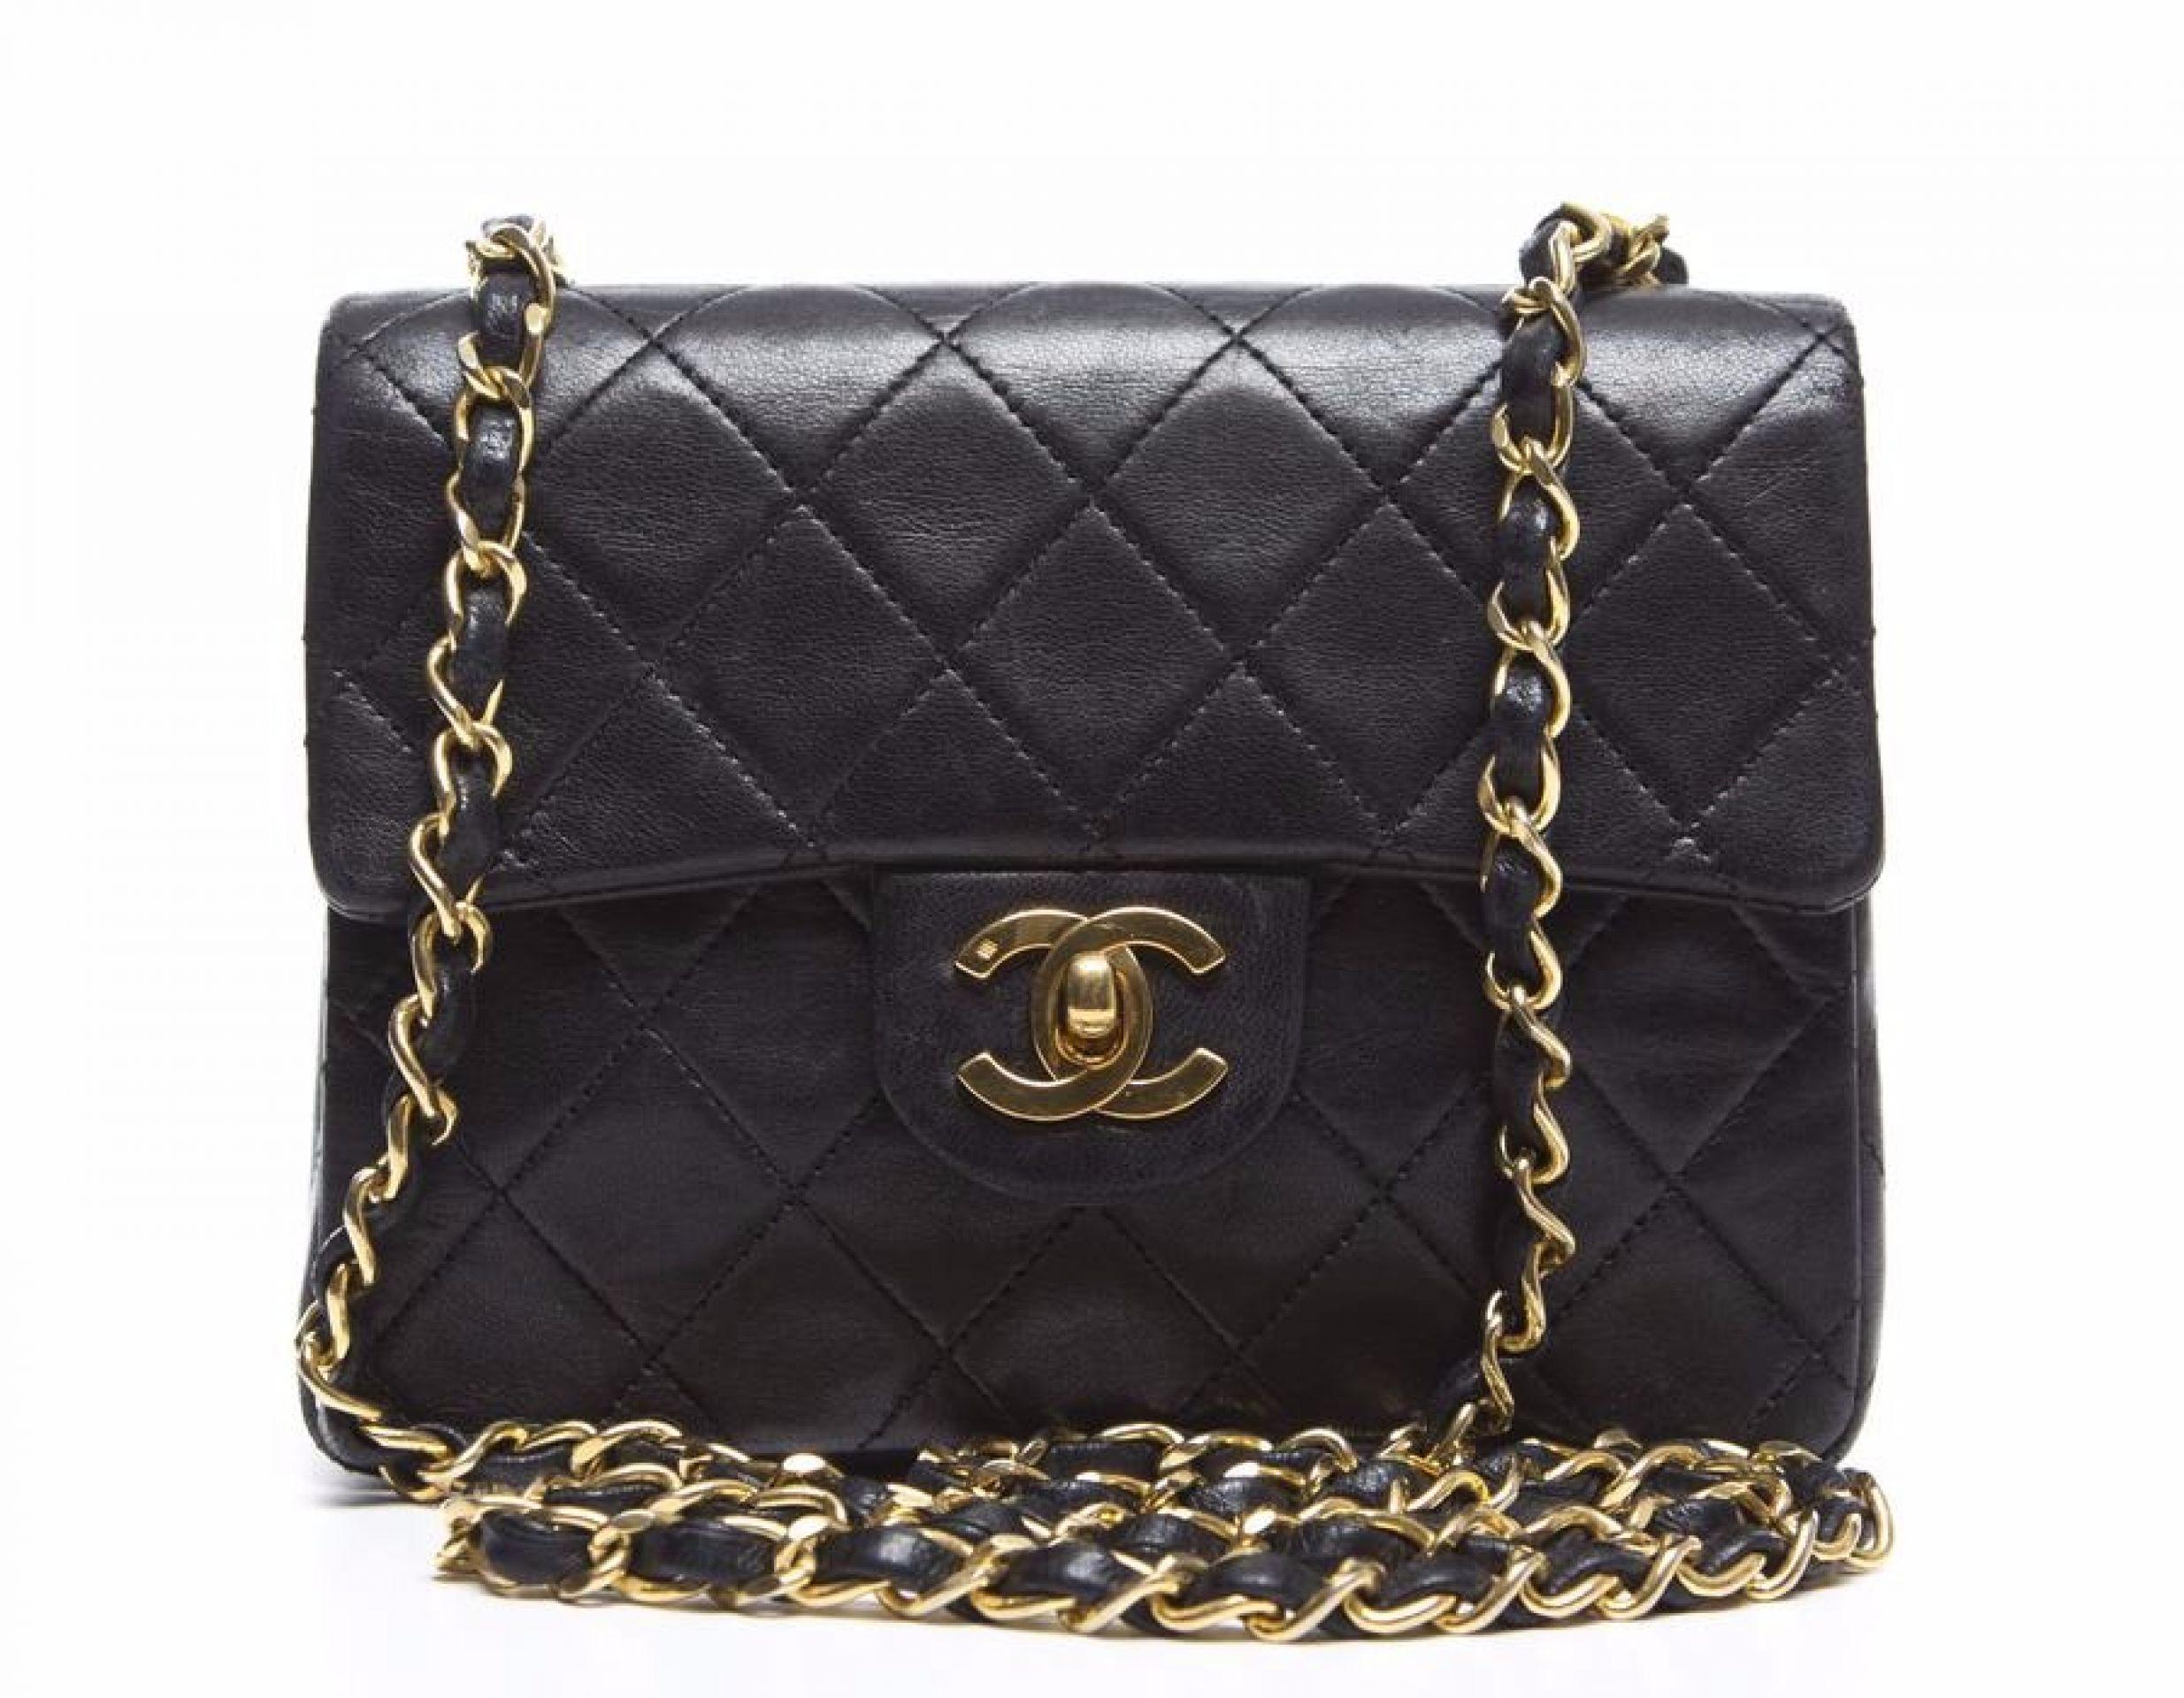 Chanel Black Lambskin Mini Flap Bag GHW